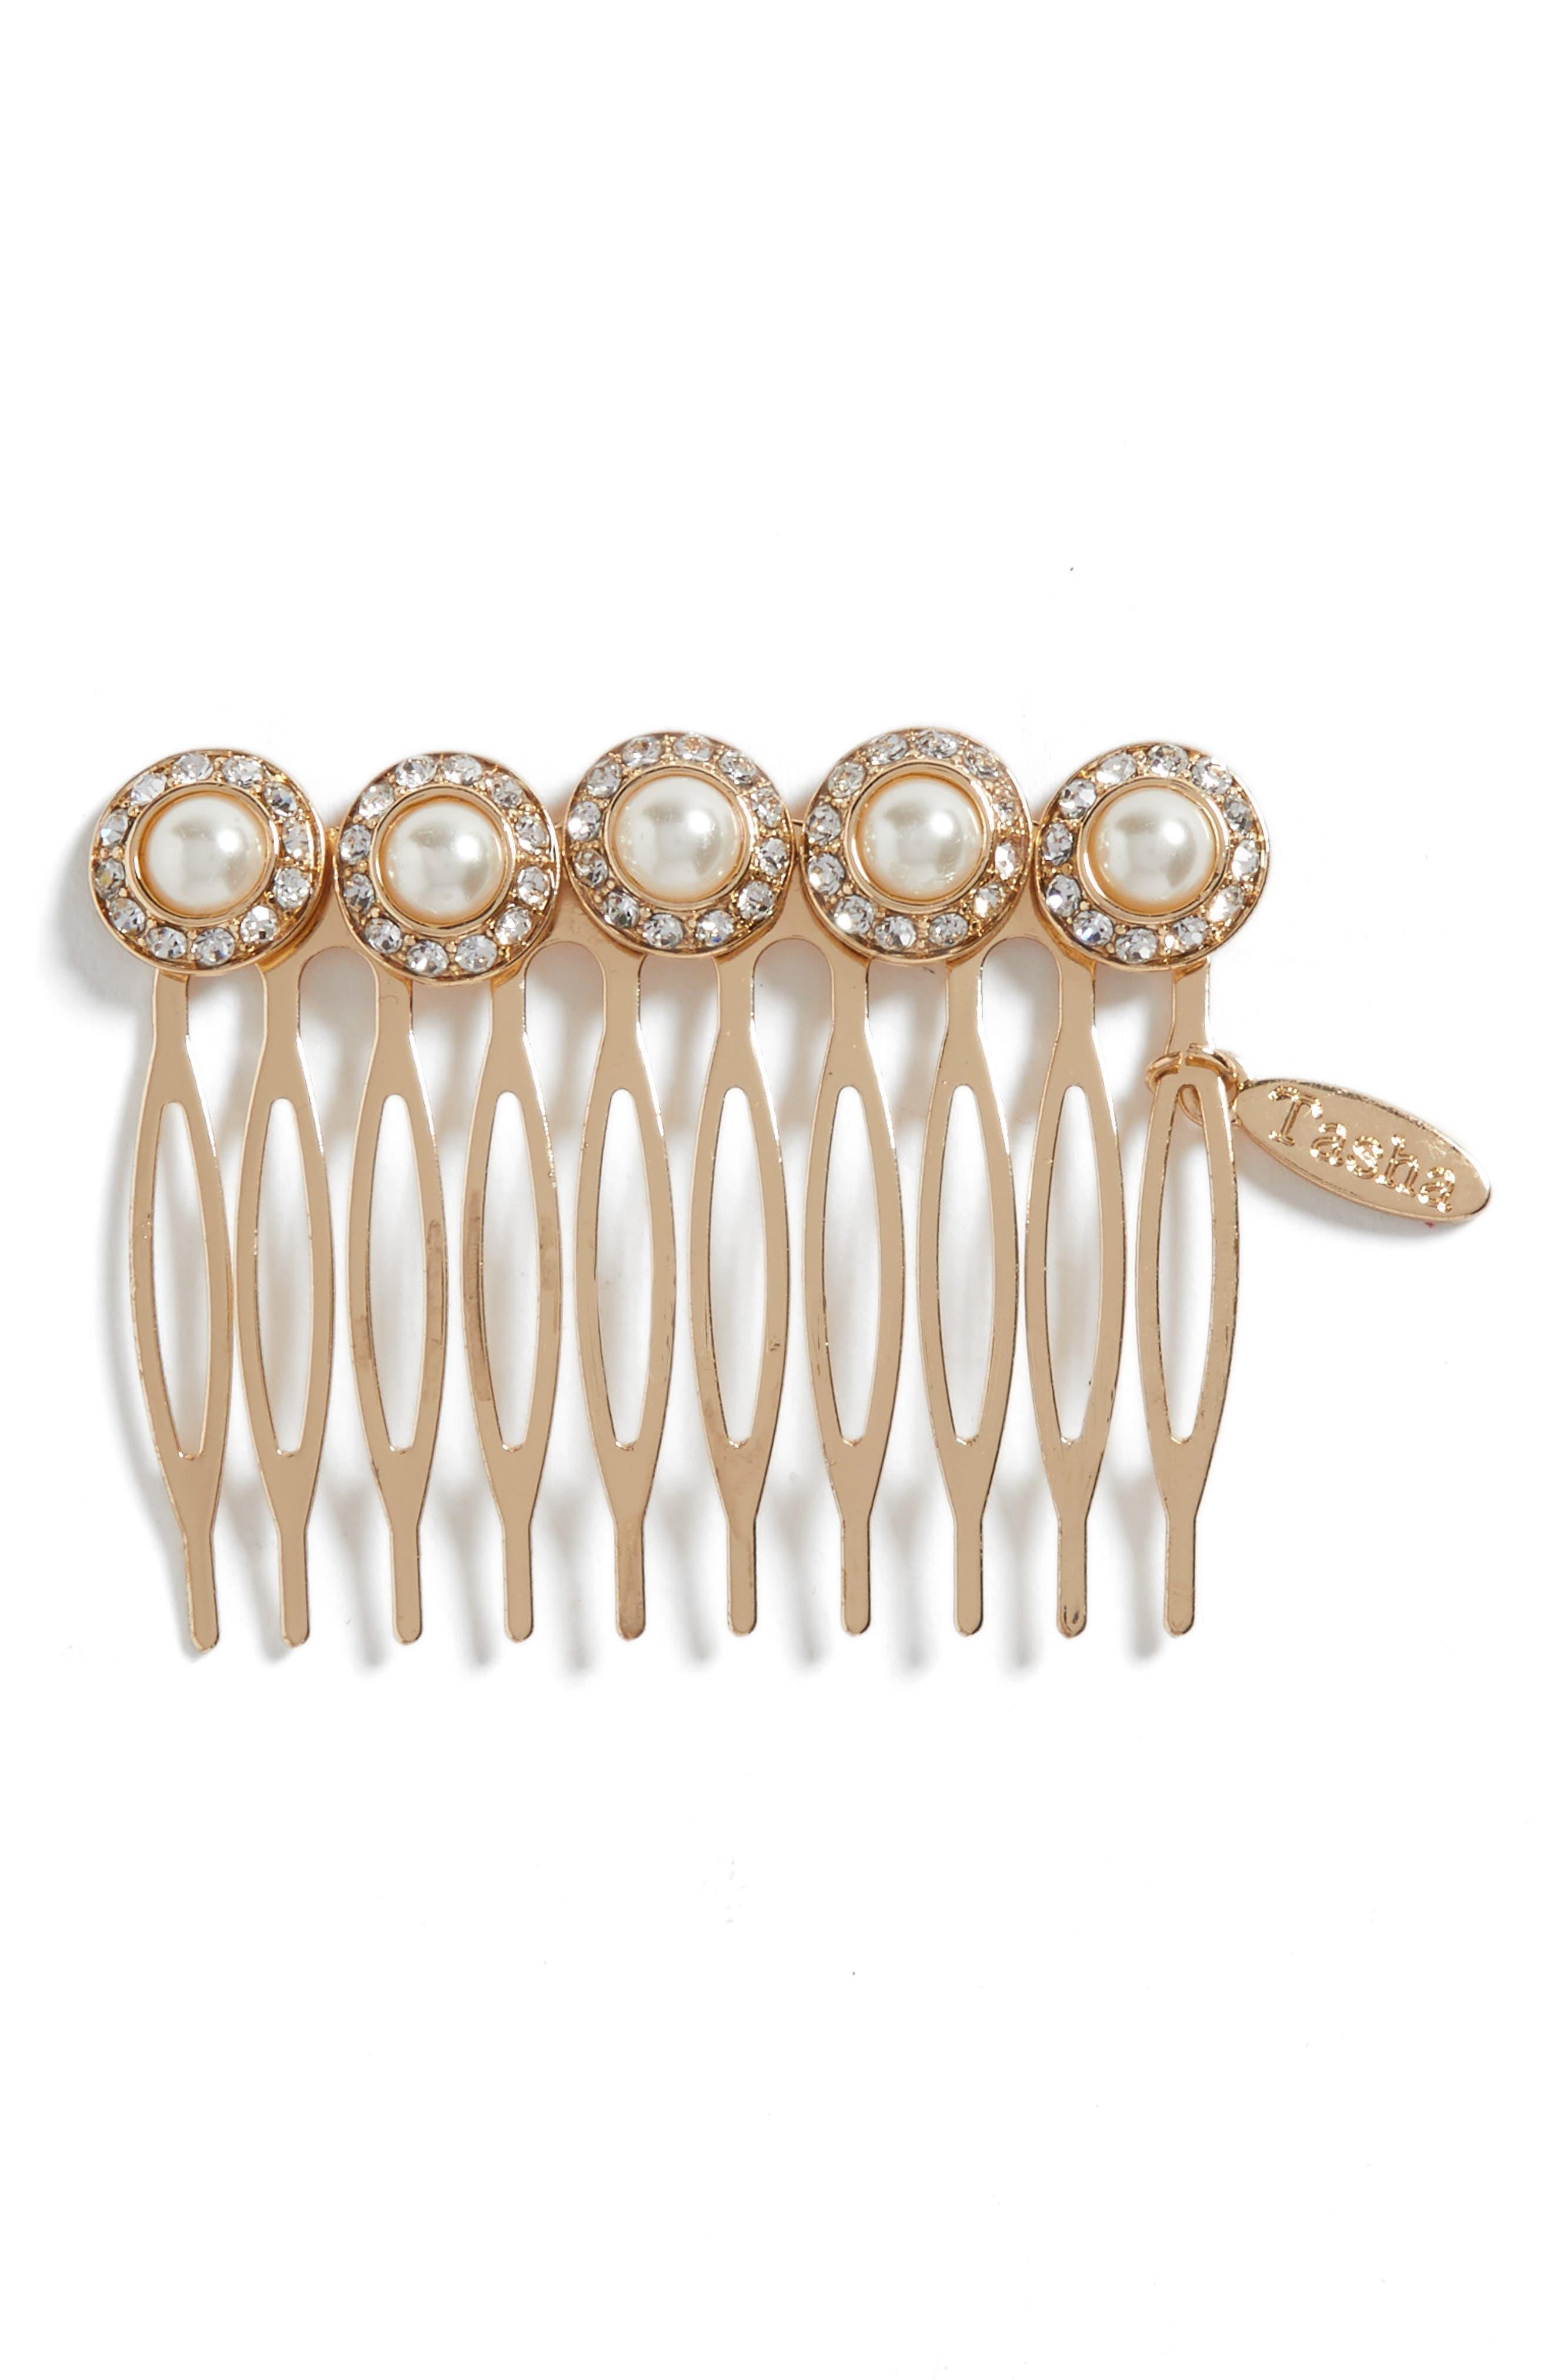 Imitation Pearl Embellished Hair Comb,                             Main thumbnail 1, color,                             Gold